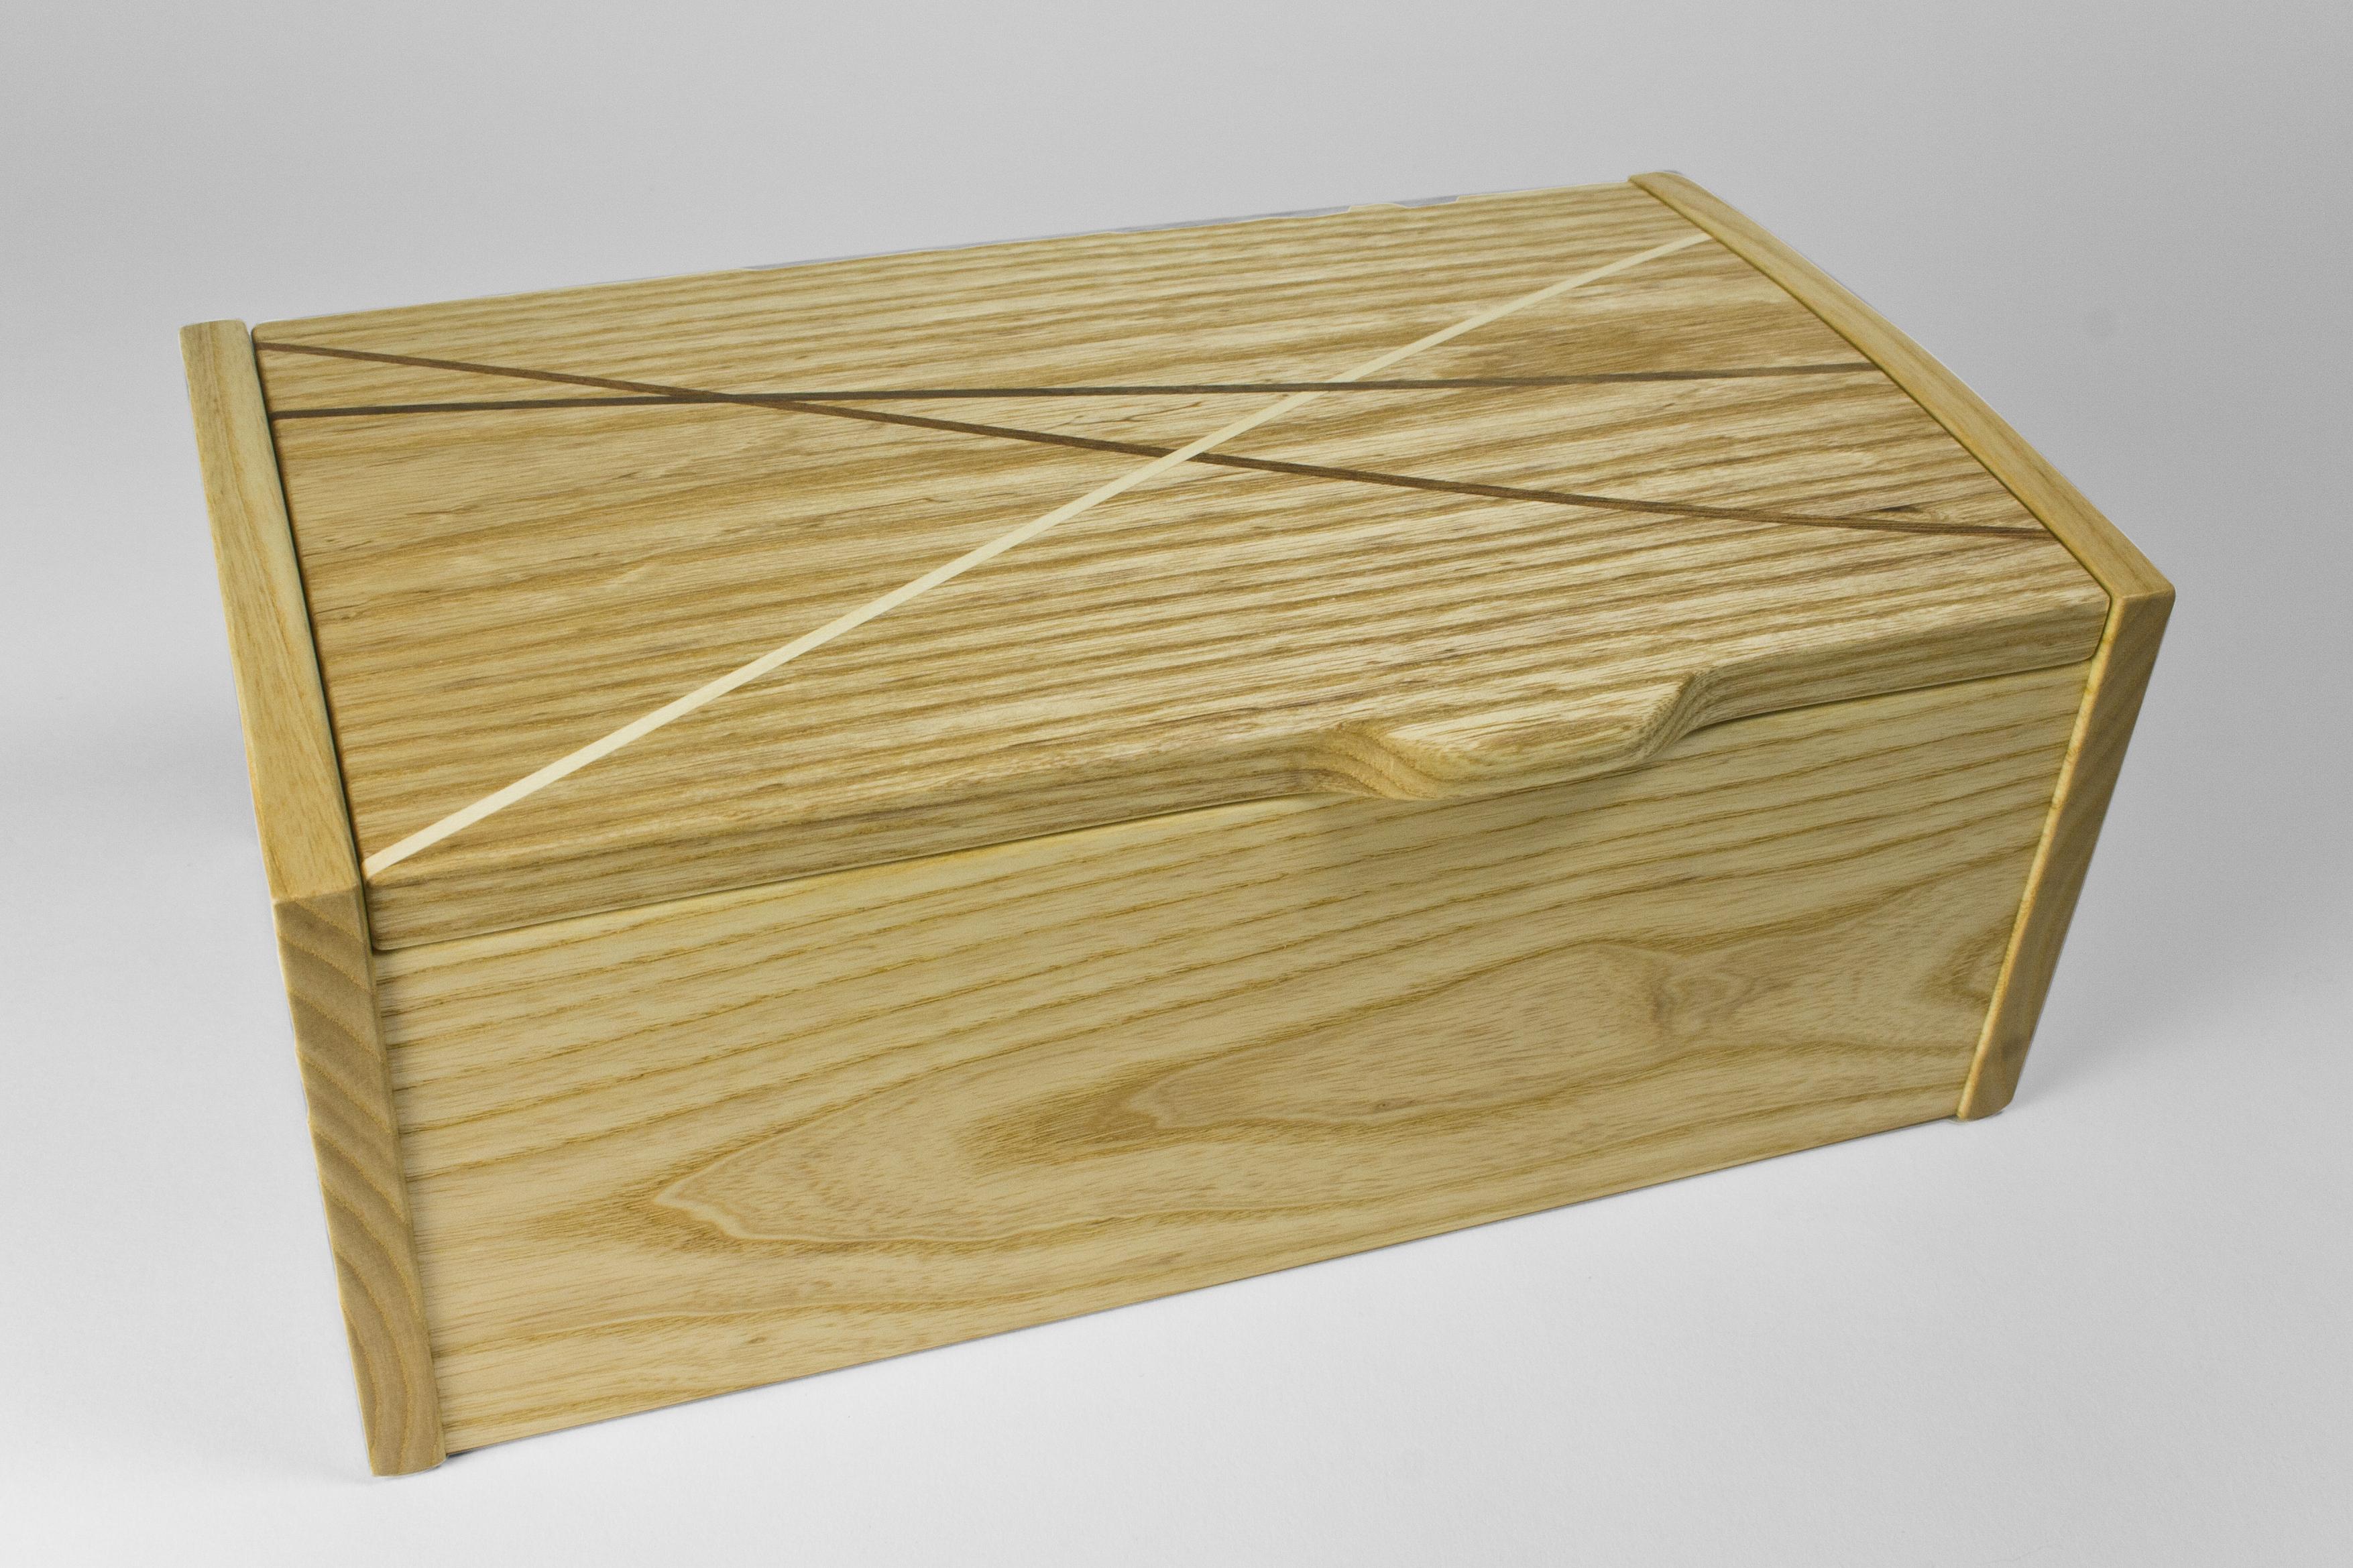 Ash 'Winding Paths' jewellery box